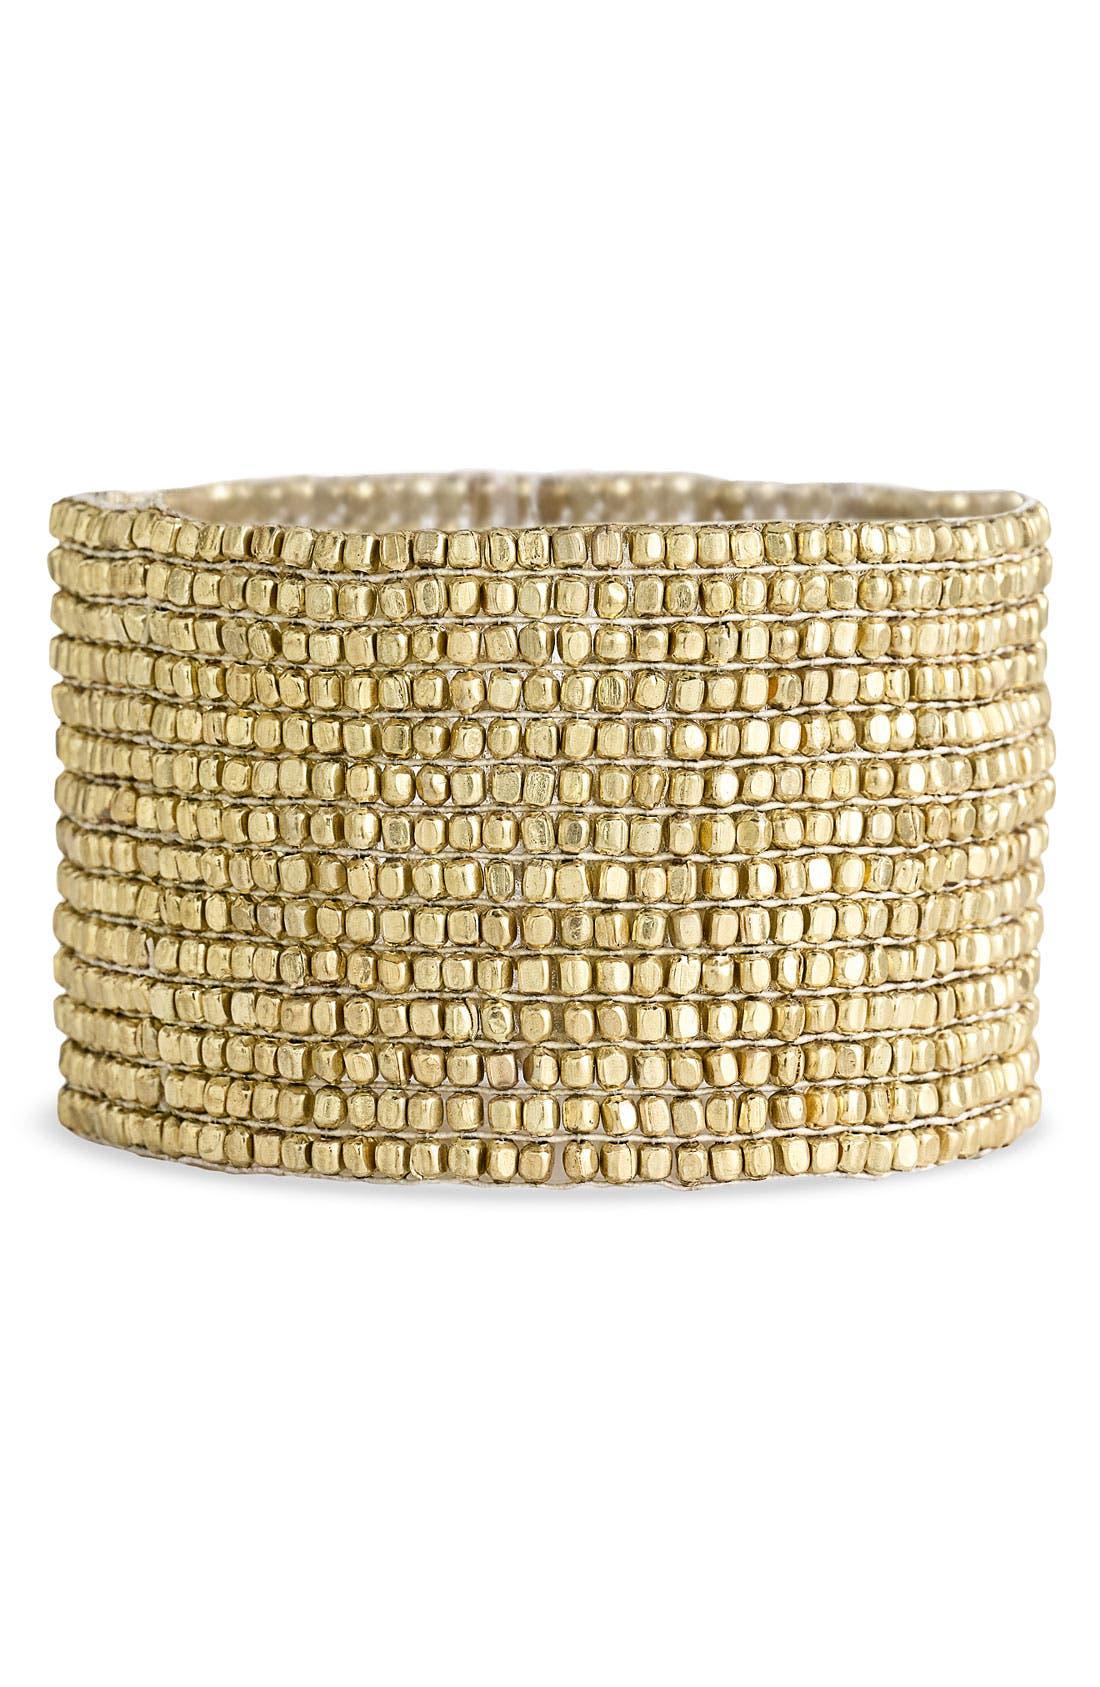 Alternate Image 1 Selected - Stephan & Co. Antique Gold Statement Stretch Bracelet